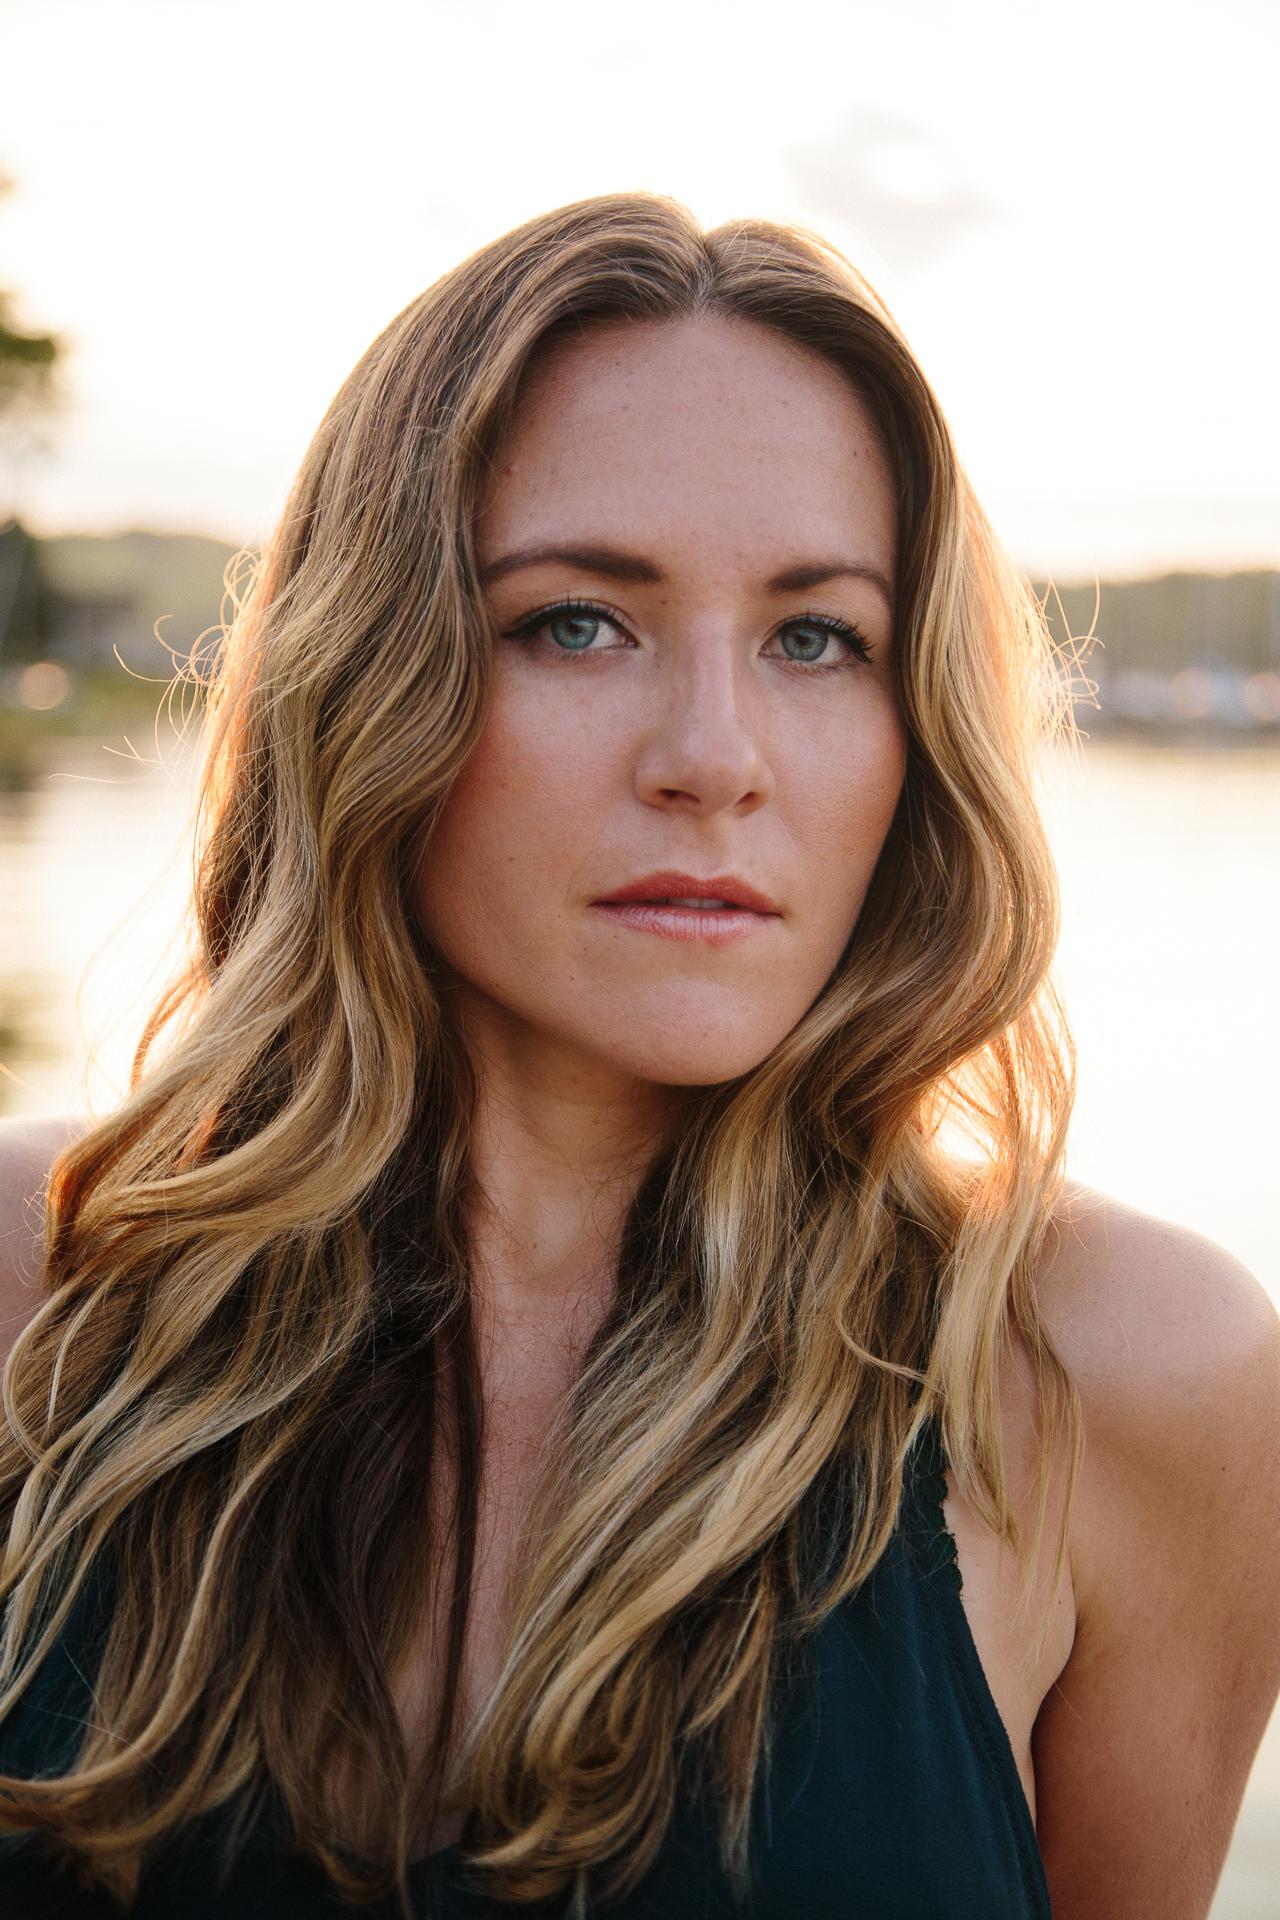 Rebekah Pahl Americana Singer/Songwriter